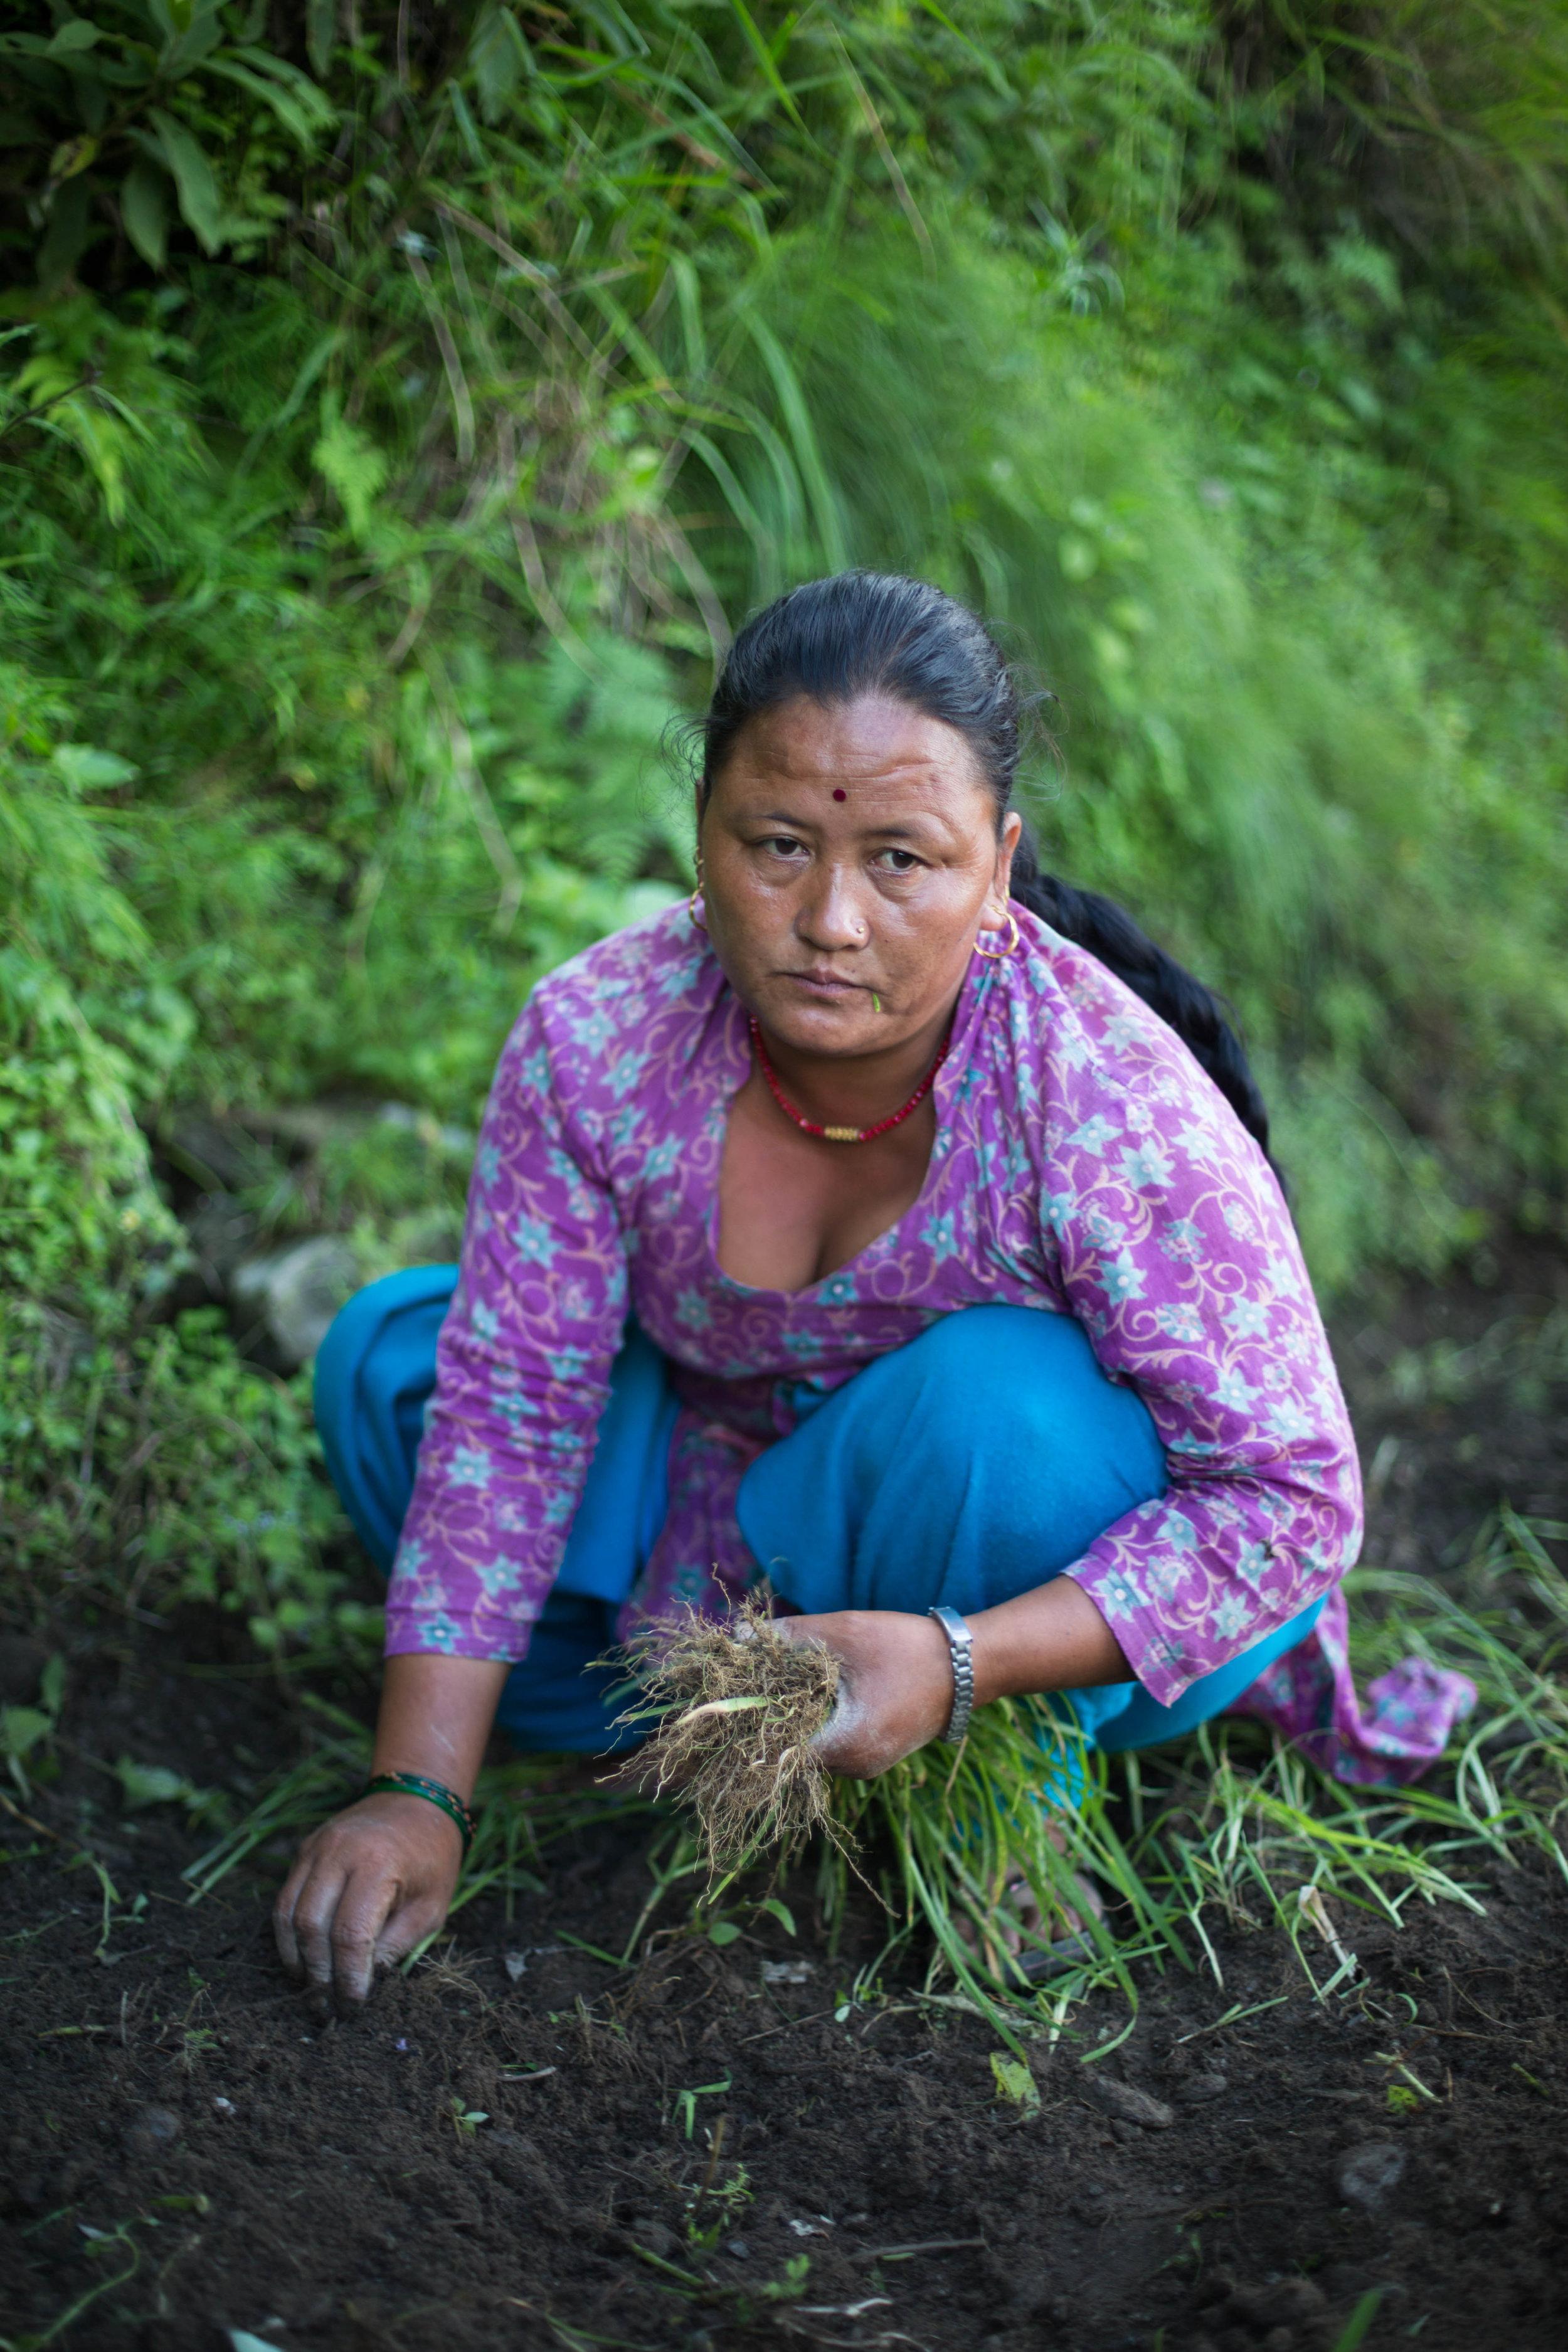 Chari plants millet in her village in Gorkha, Nepal.